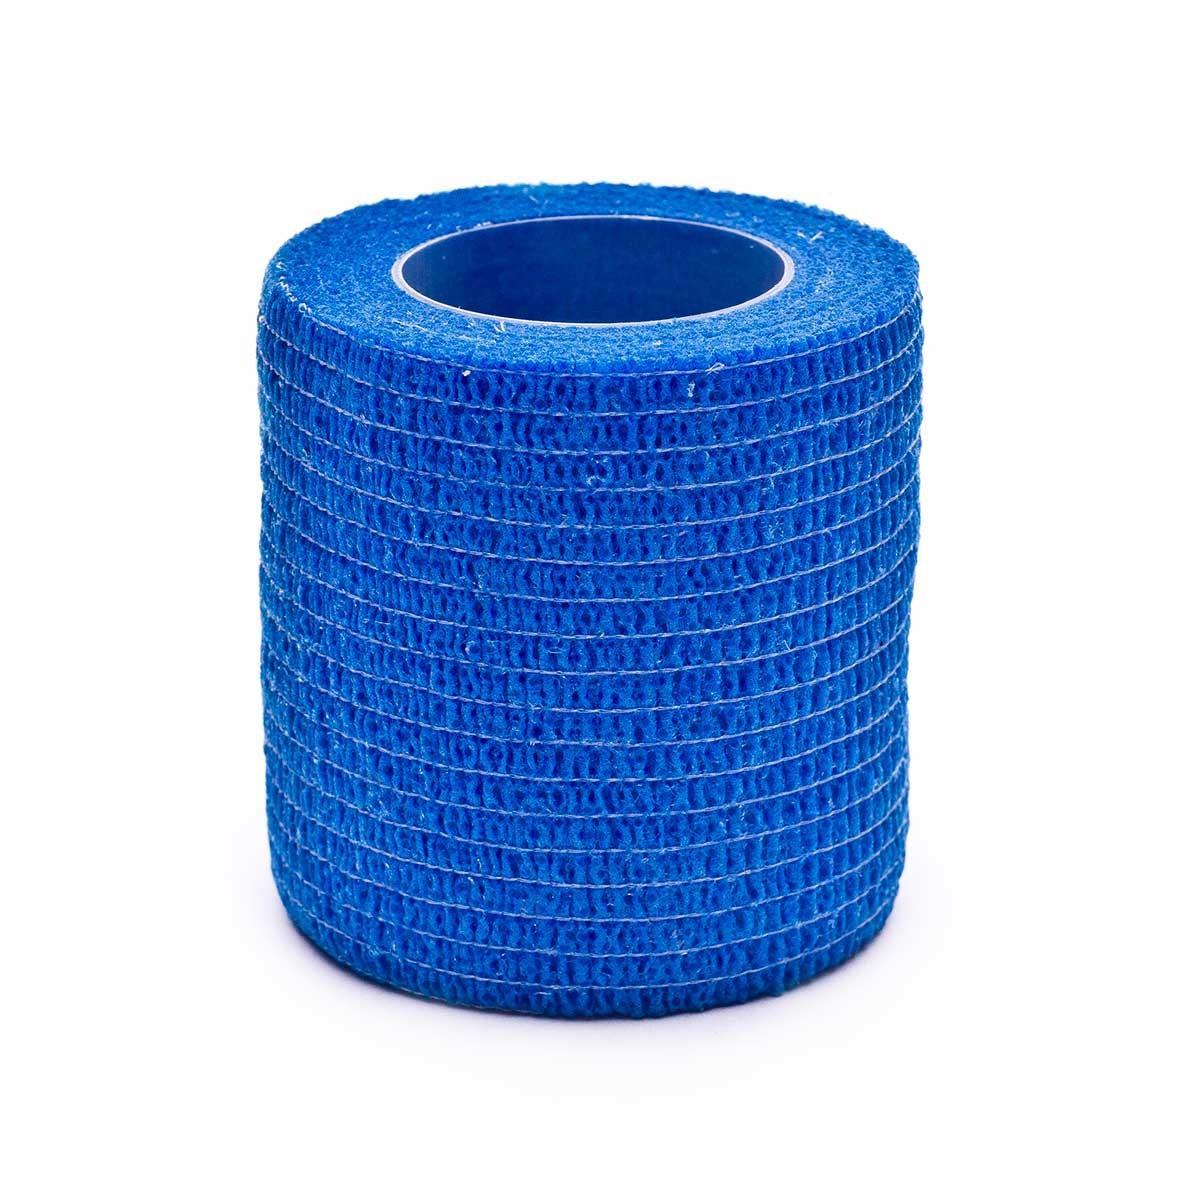 Venda Elástica Cohesiva 5 cm x 4,5 m Azul.